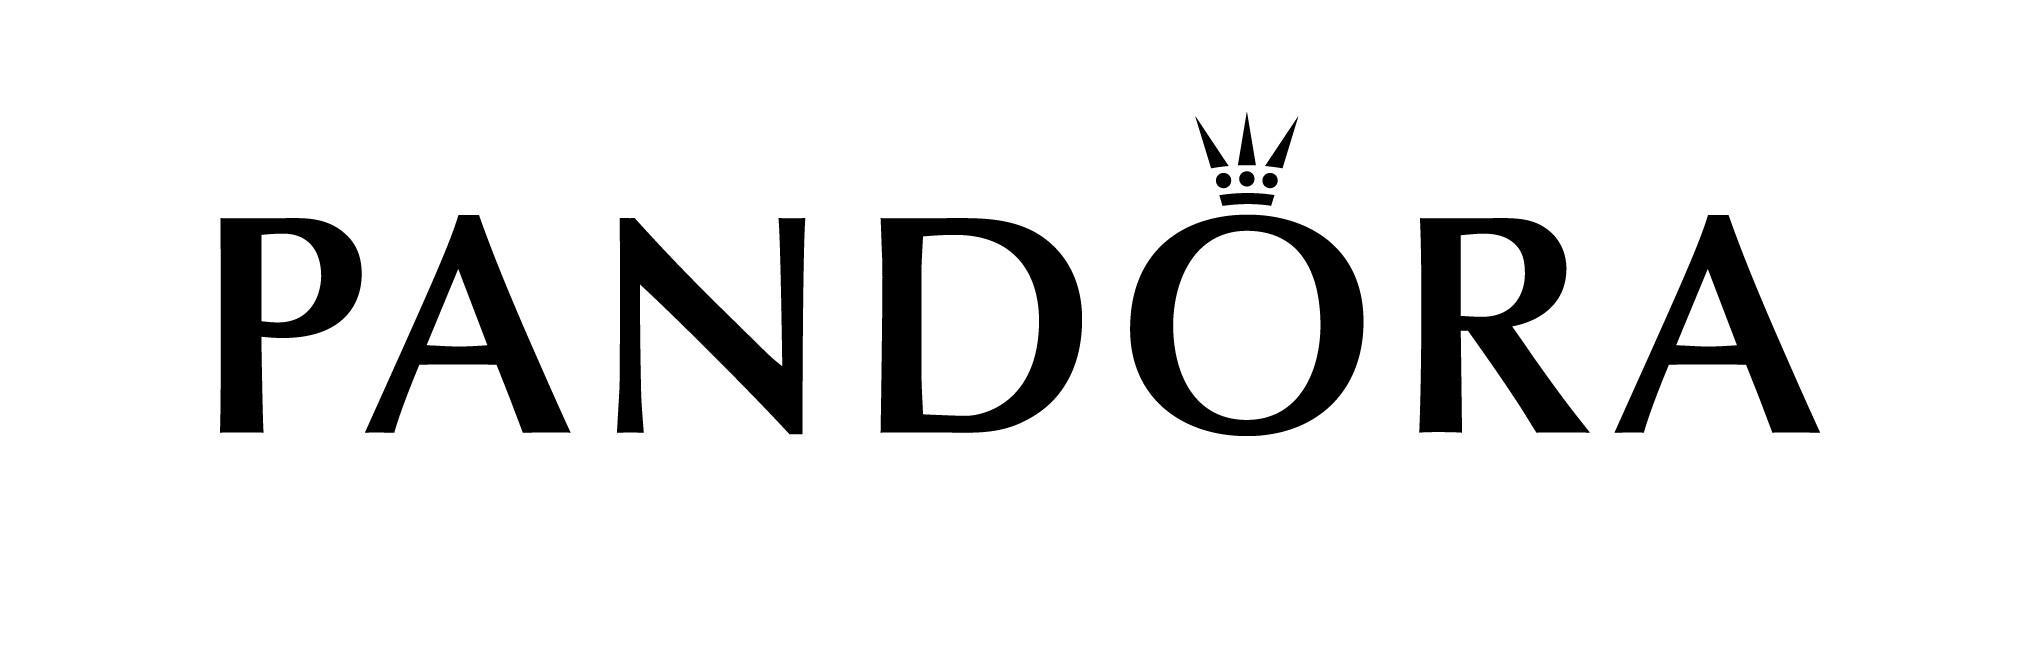 Cn Pandora Vouchers